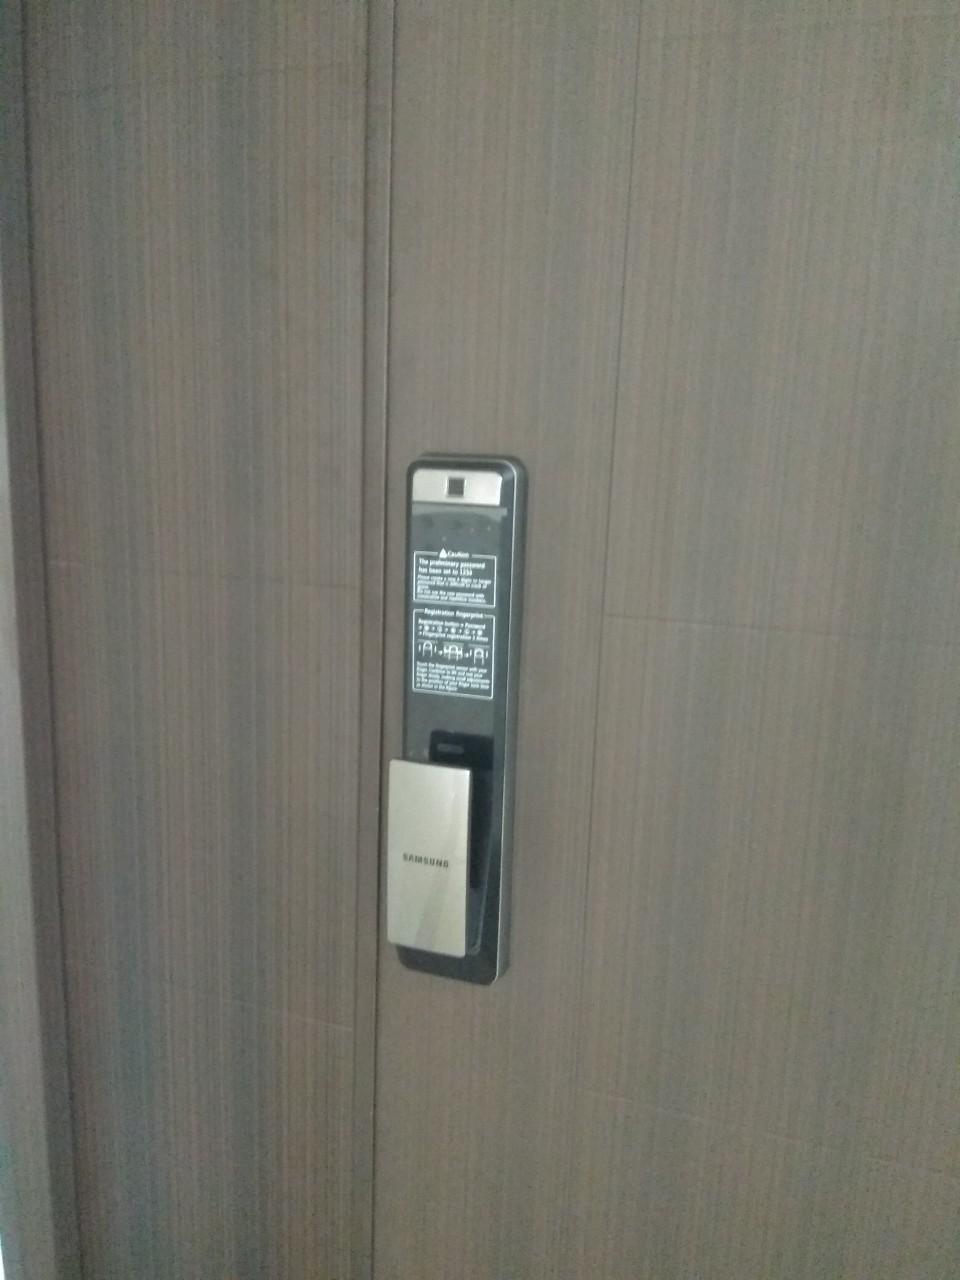 Samsung DP609